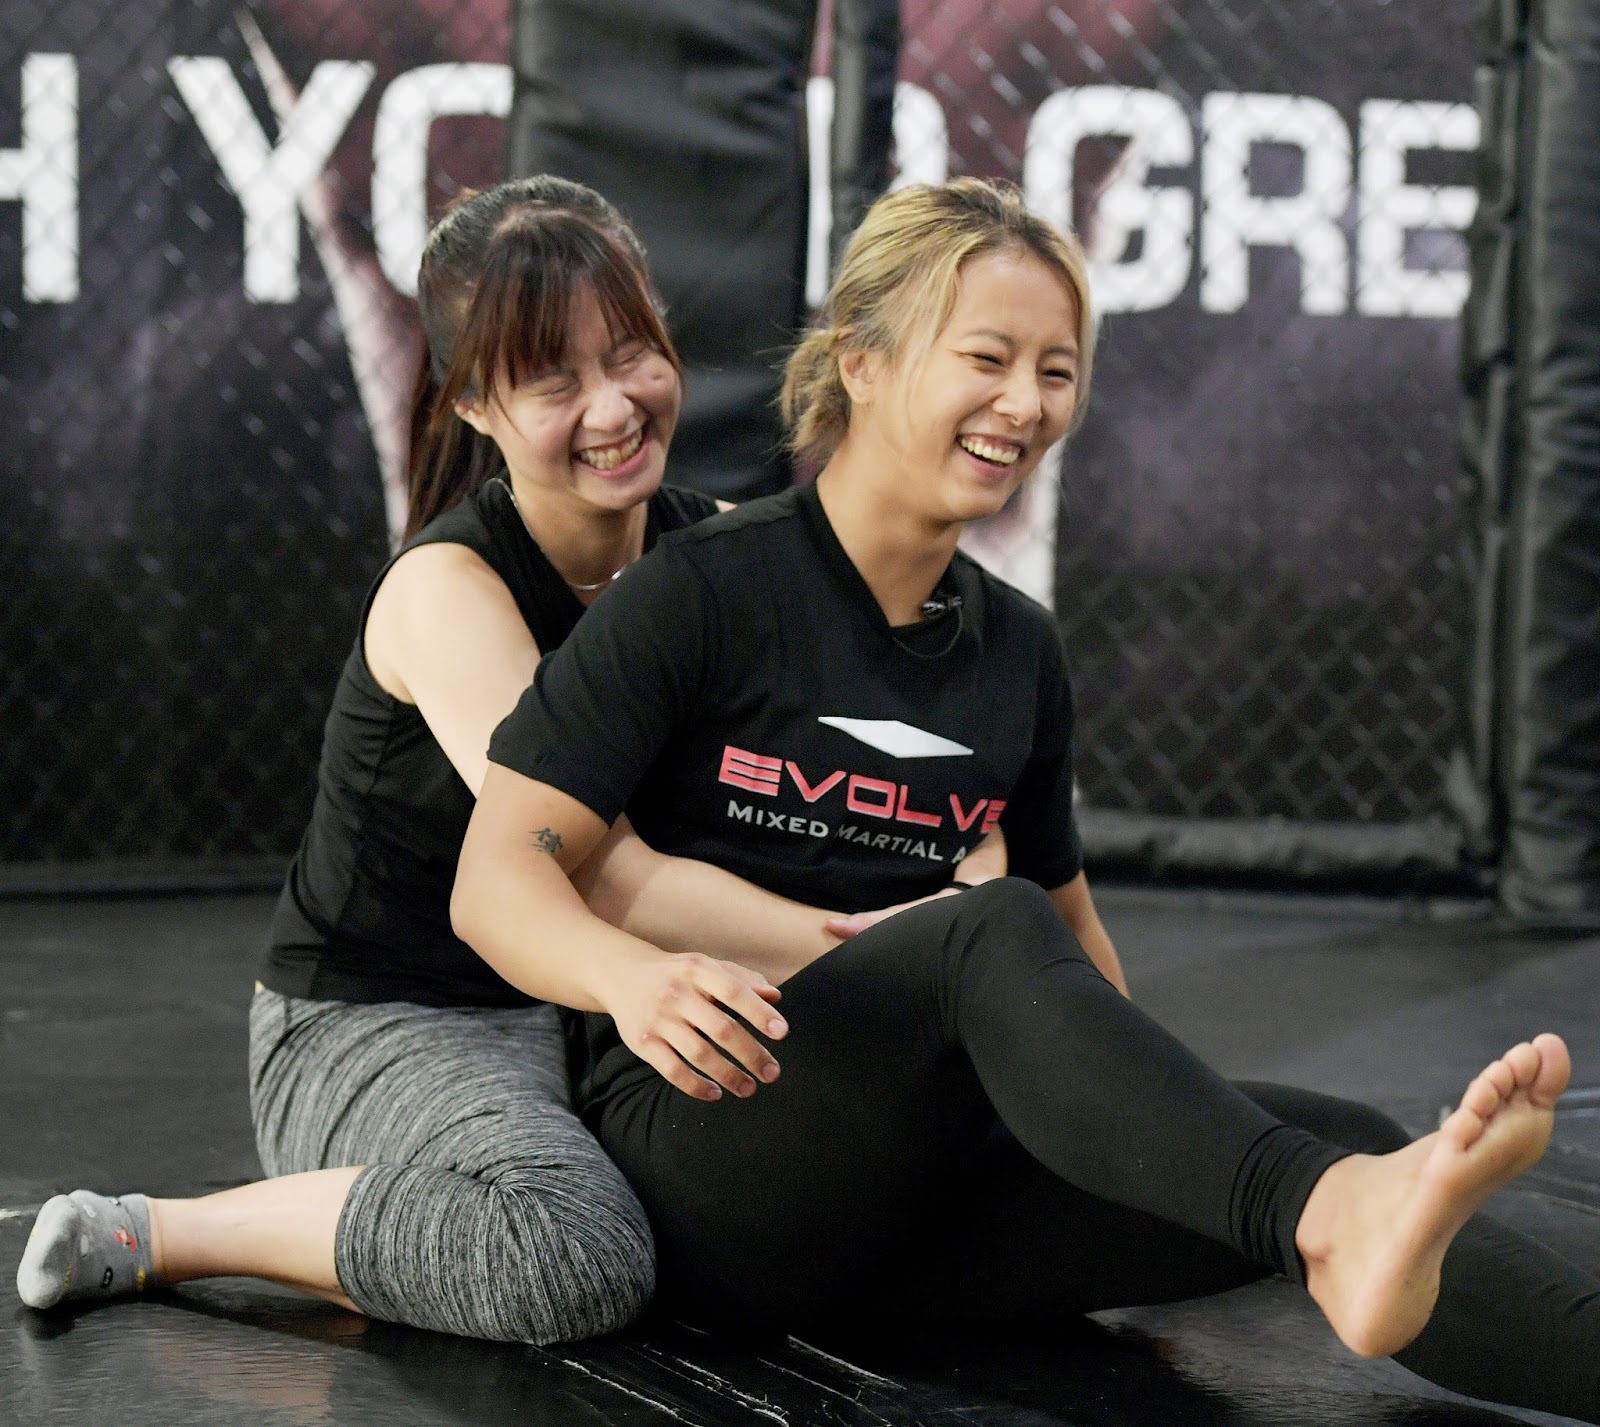 Song Ka Yeon (송가연), Korean mixed martial artist